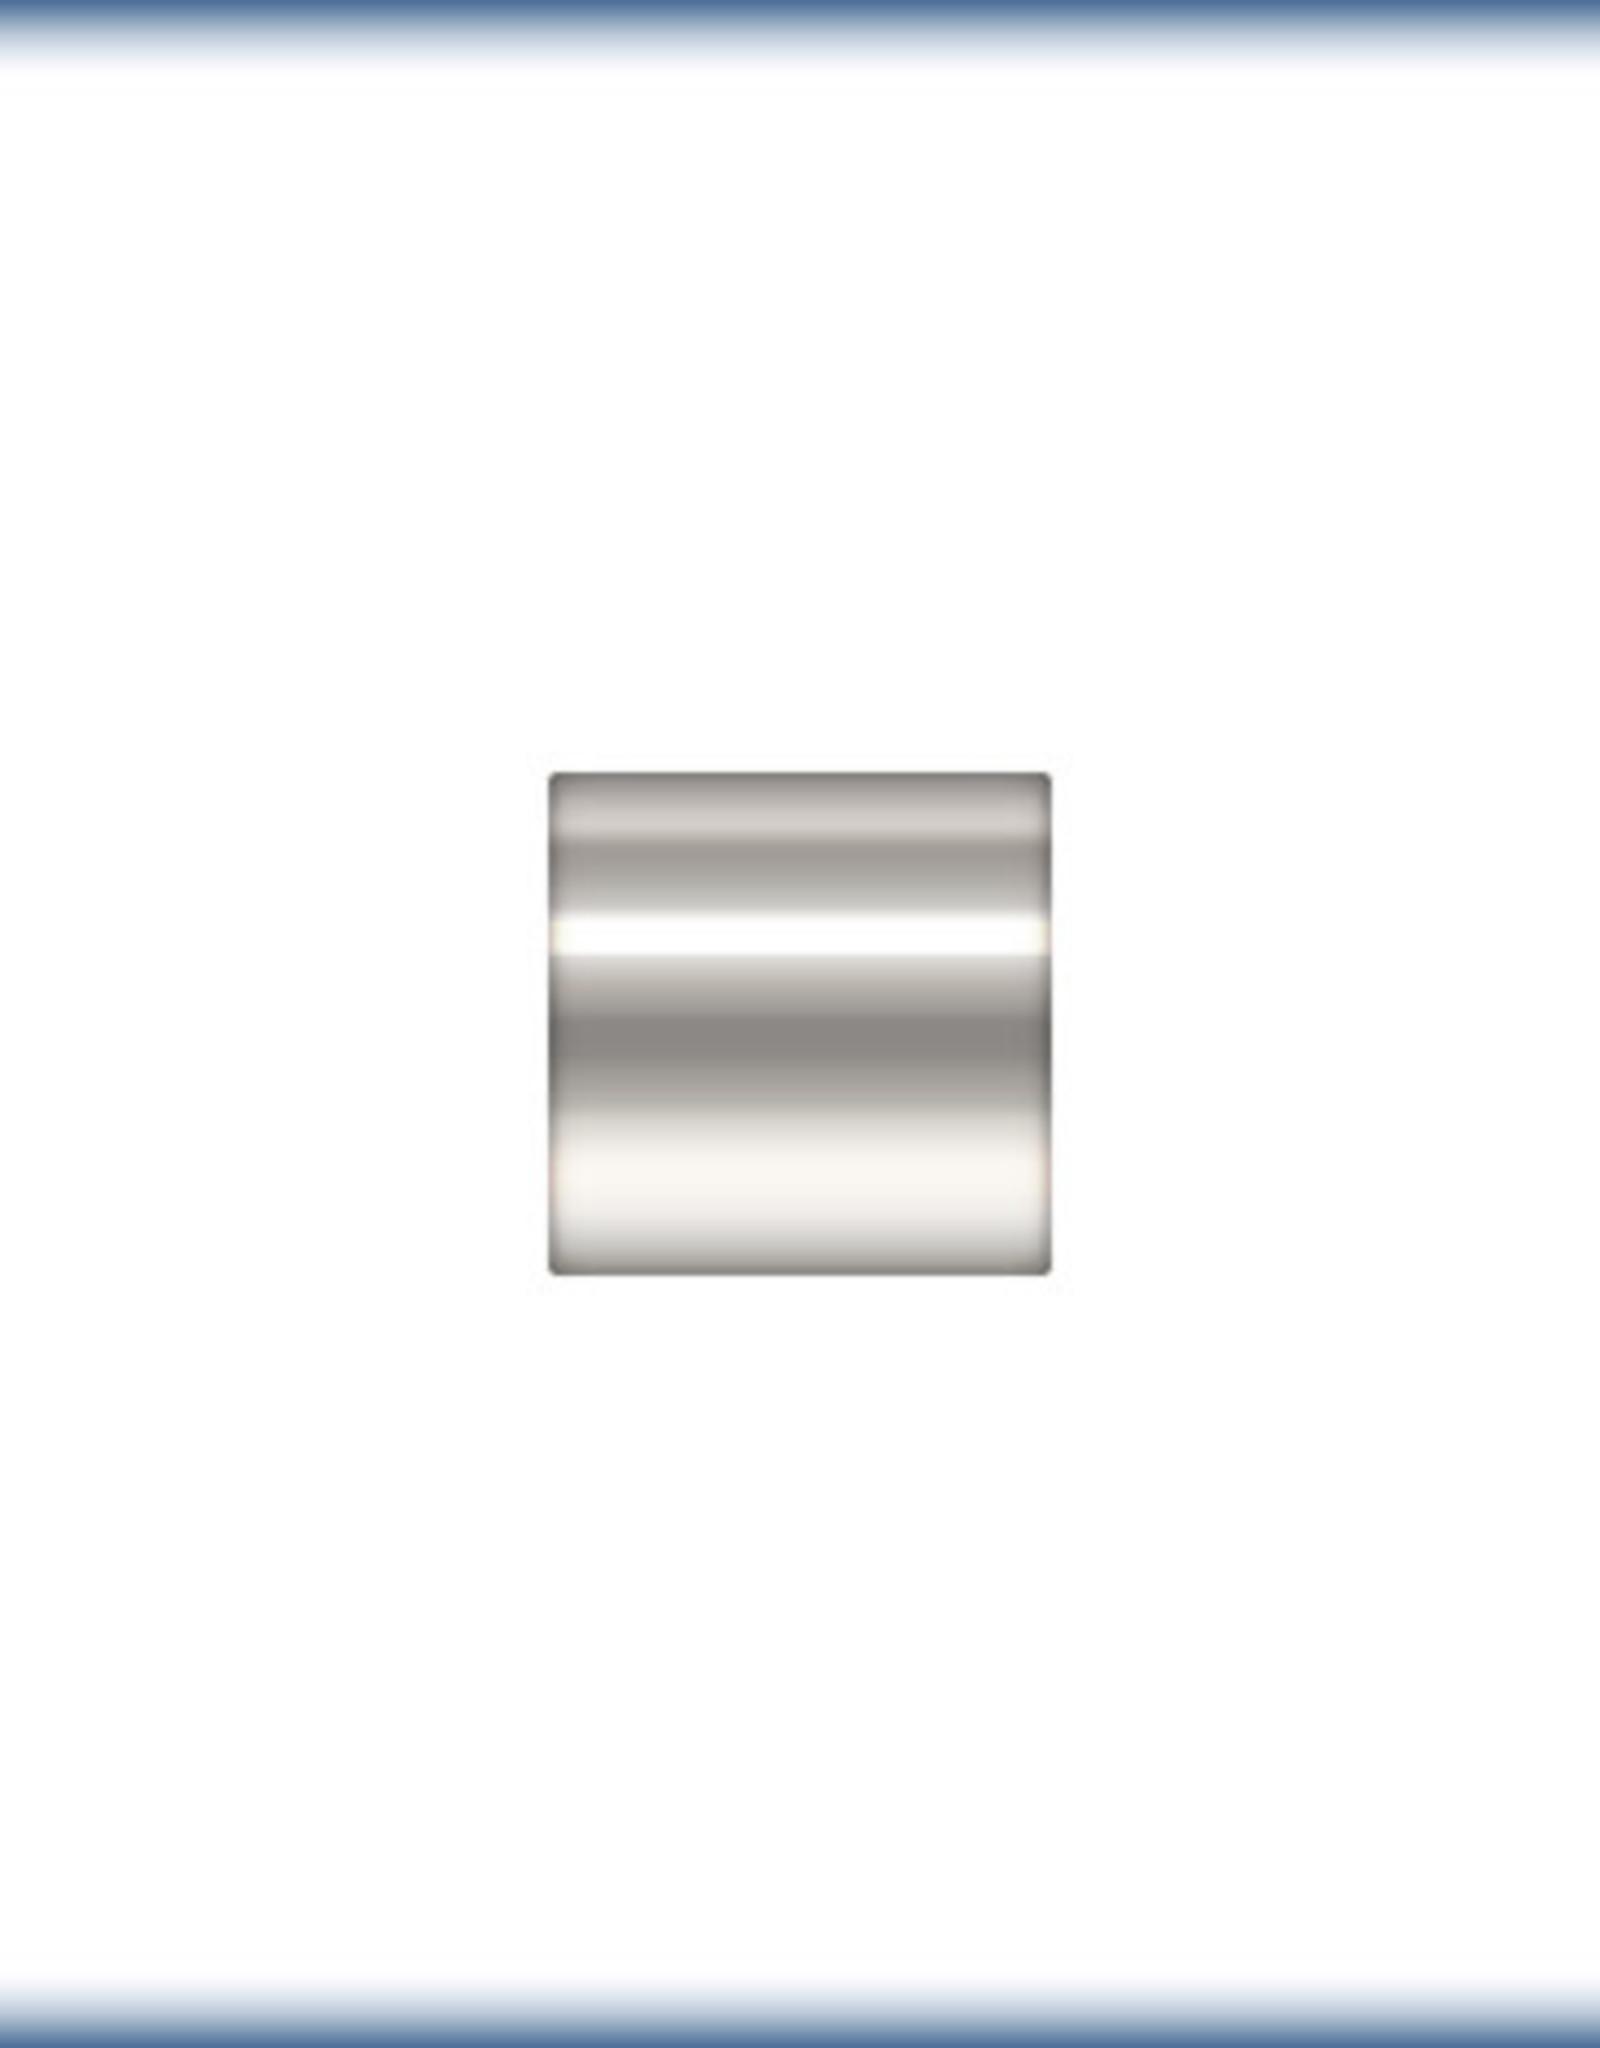 2x2 Crimp Tubes Sterling Silver Qty 25